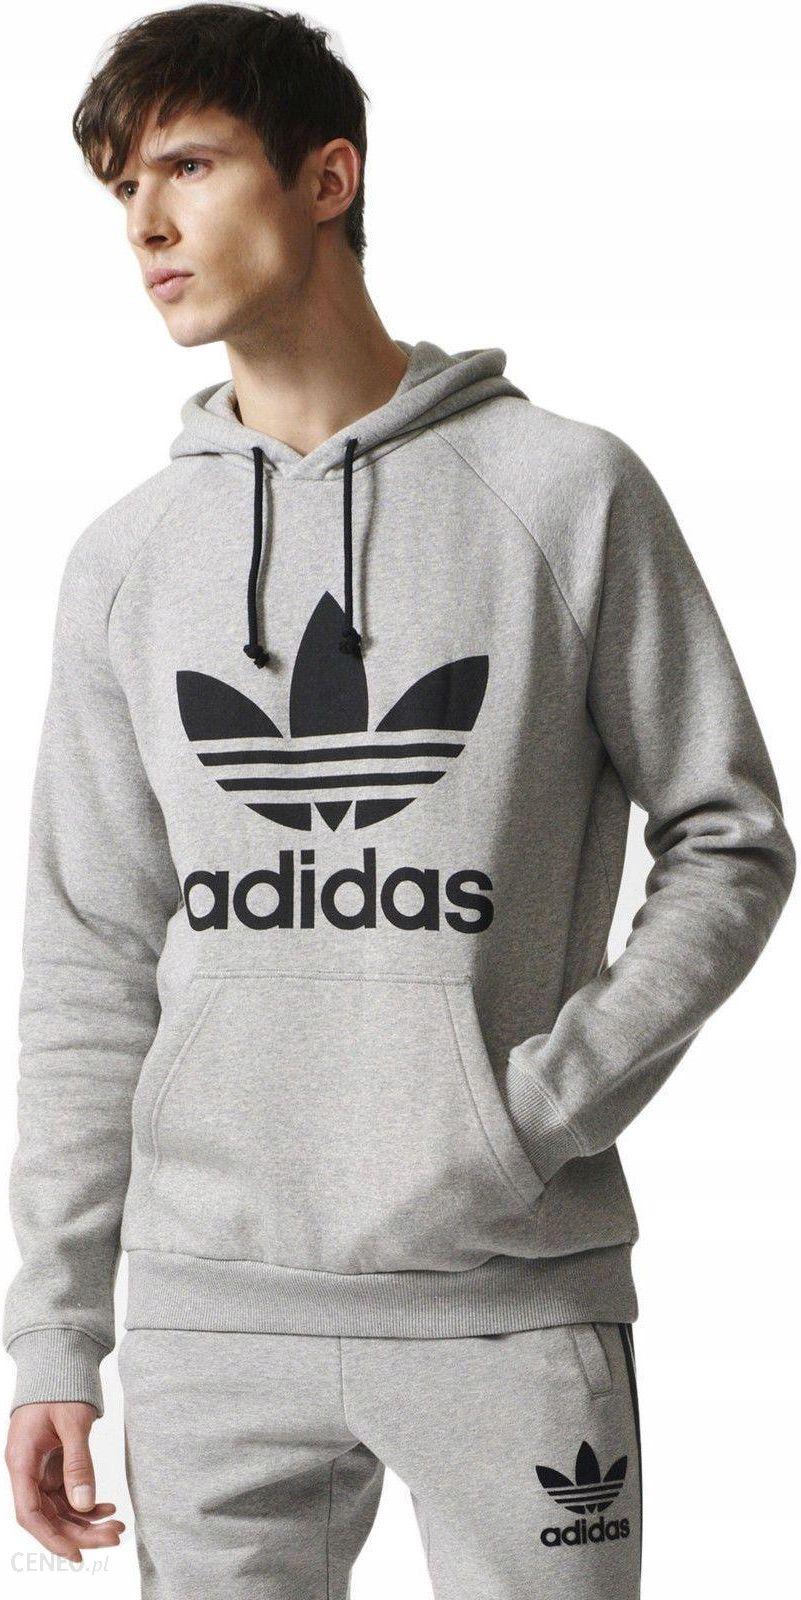 Ciepła męska bluza ADIDAS Cena 179,99 Adidas Reebok